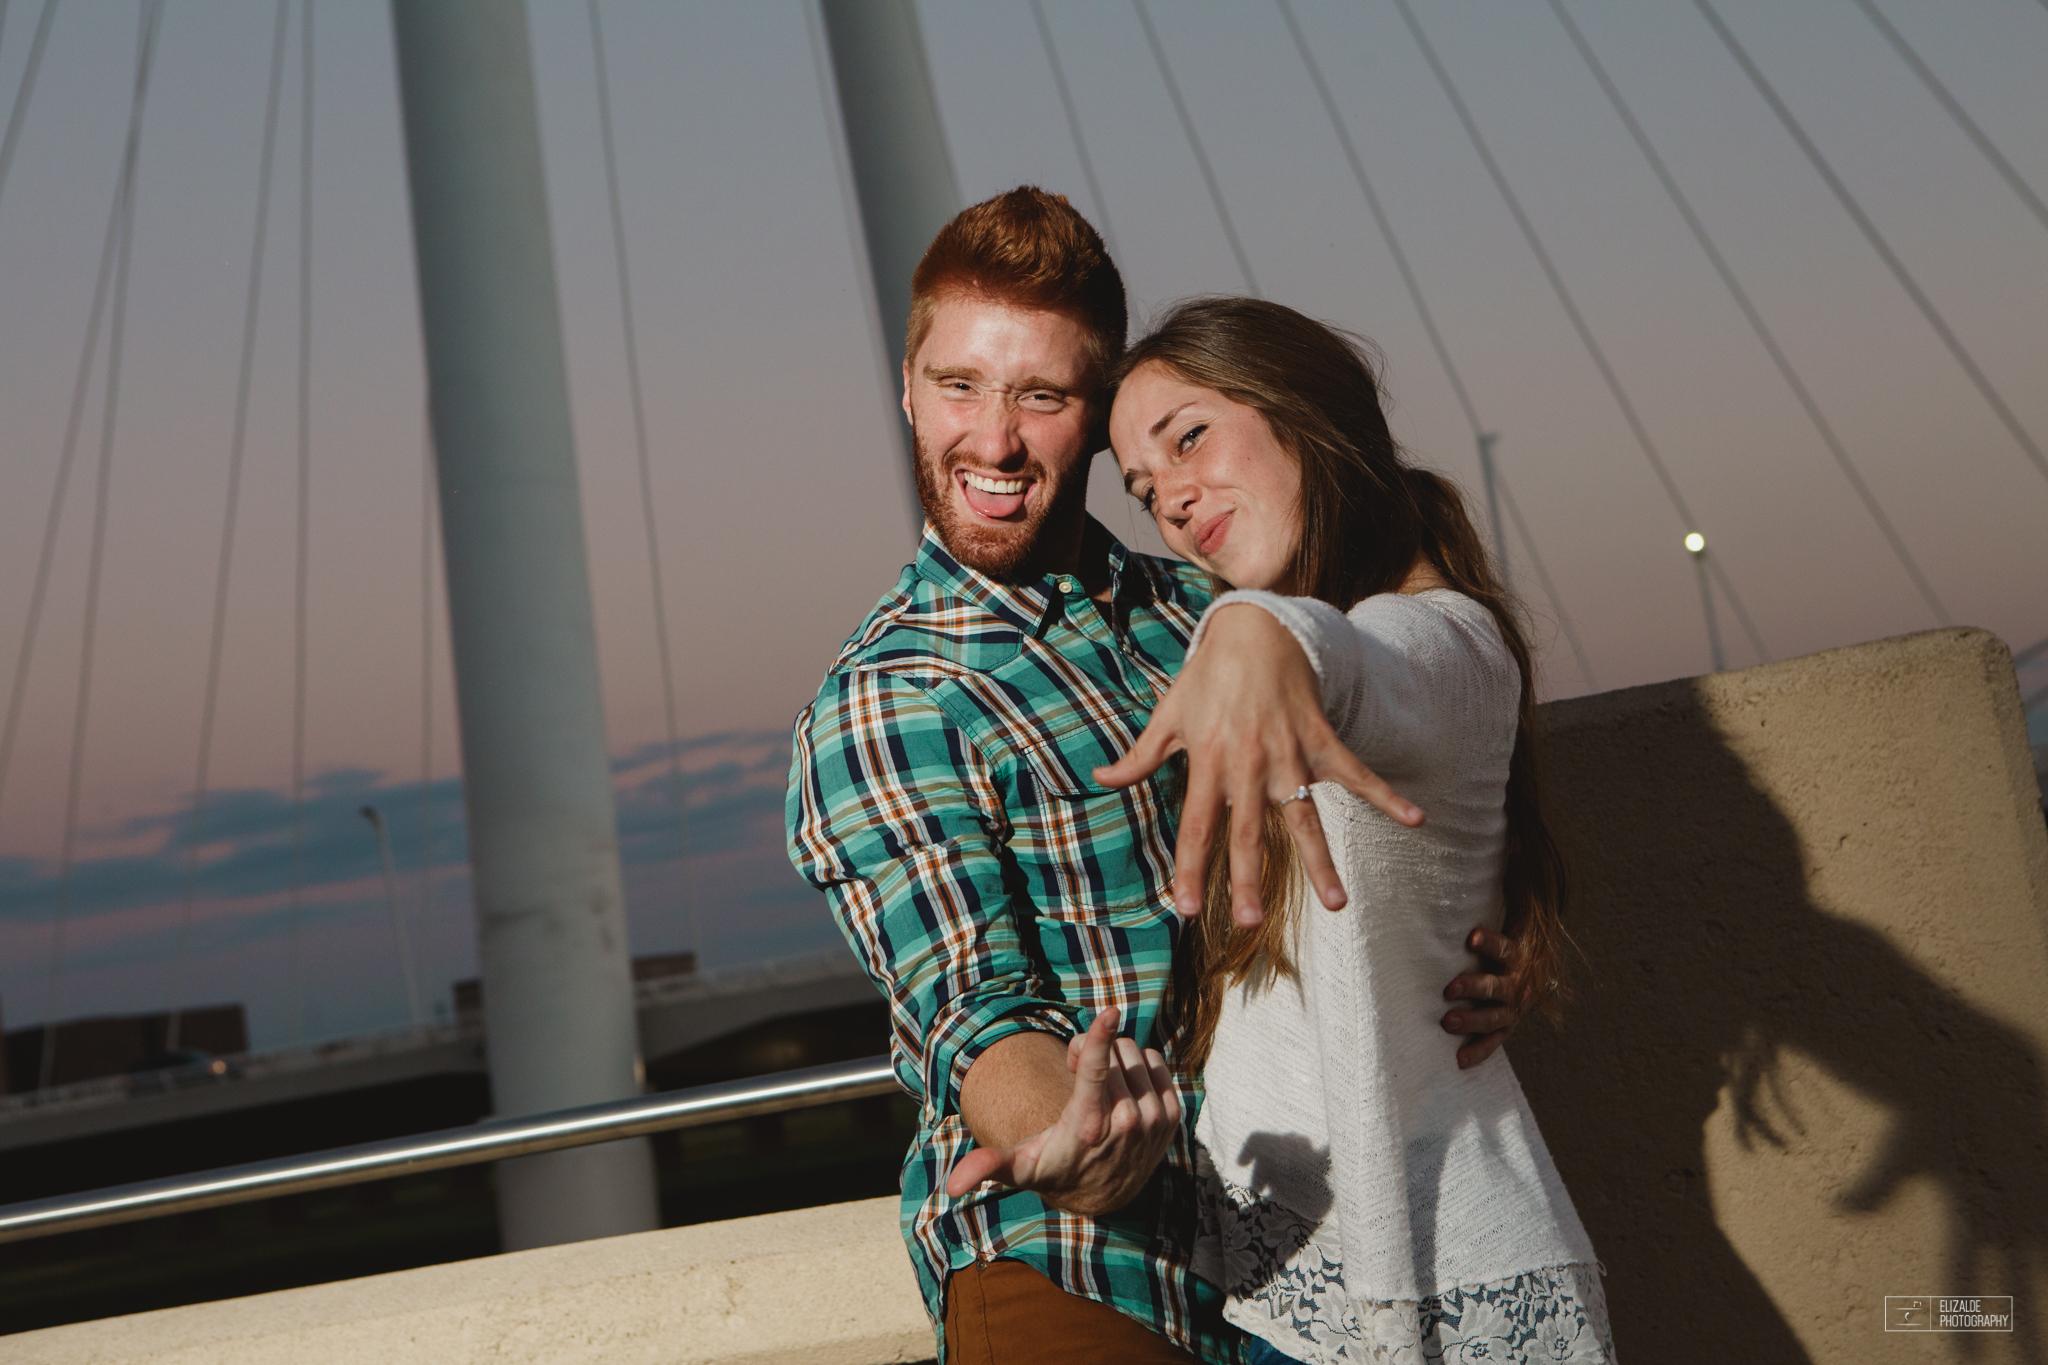 Proposal_DFW Wedding Photographer_Dallas Photographer_Elizalde Photography_margaret hunt hill bridge (16 of 21).jpg